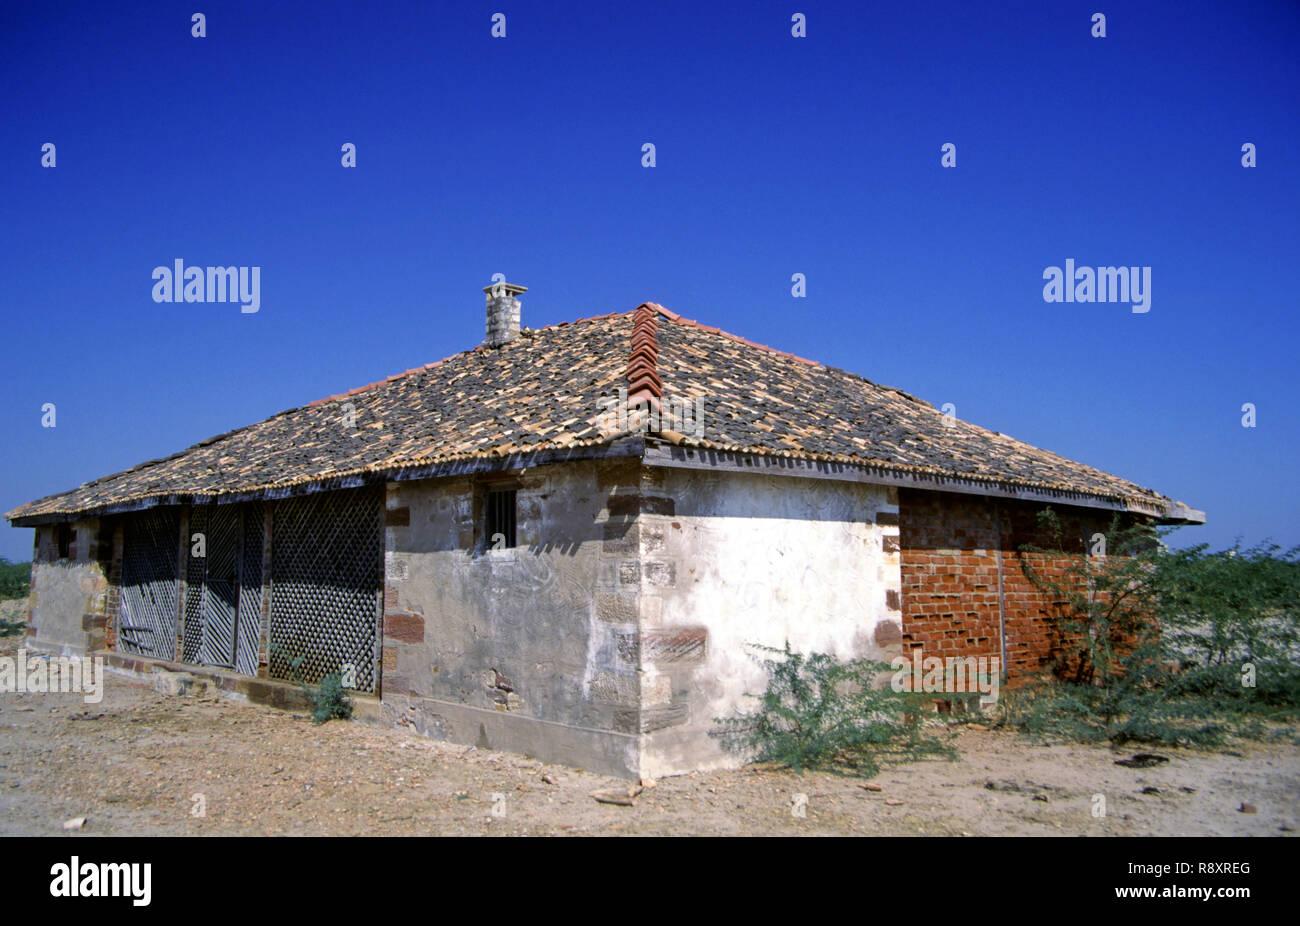 Old British Rest House, Jhinjhuwada, Gujarat, India - Stock Image